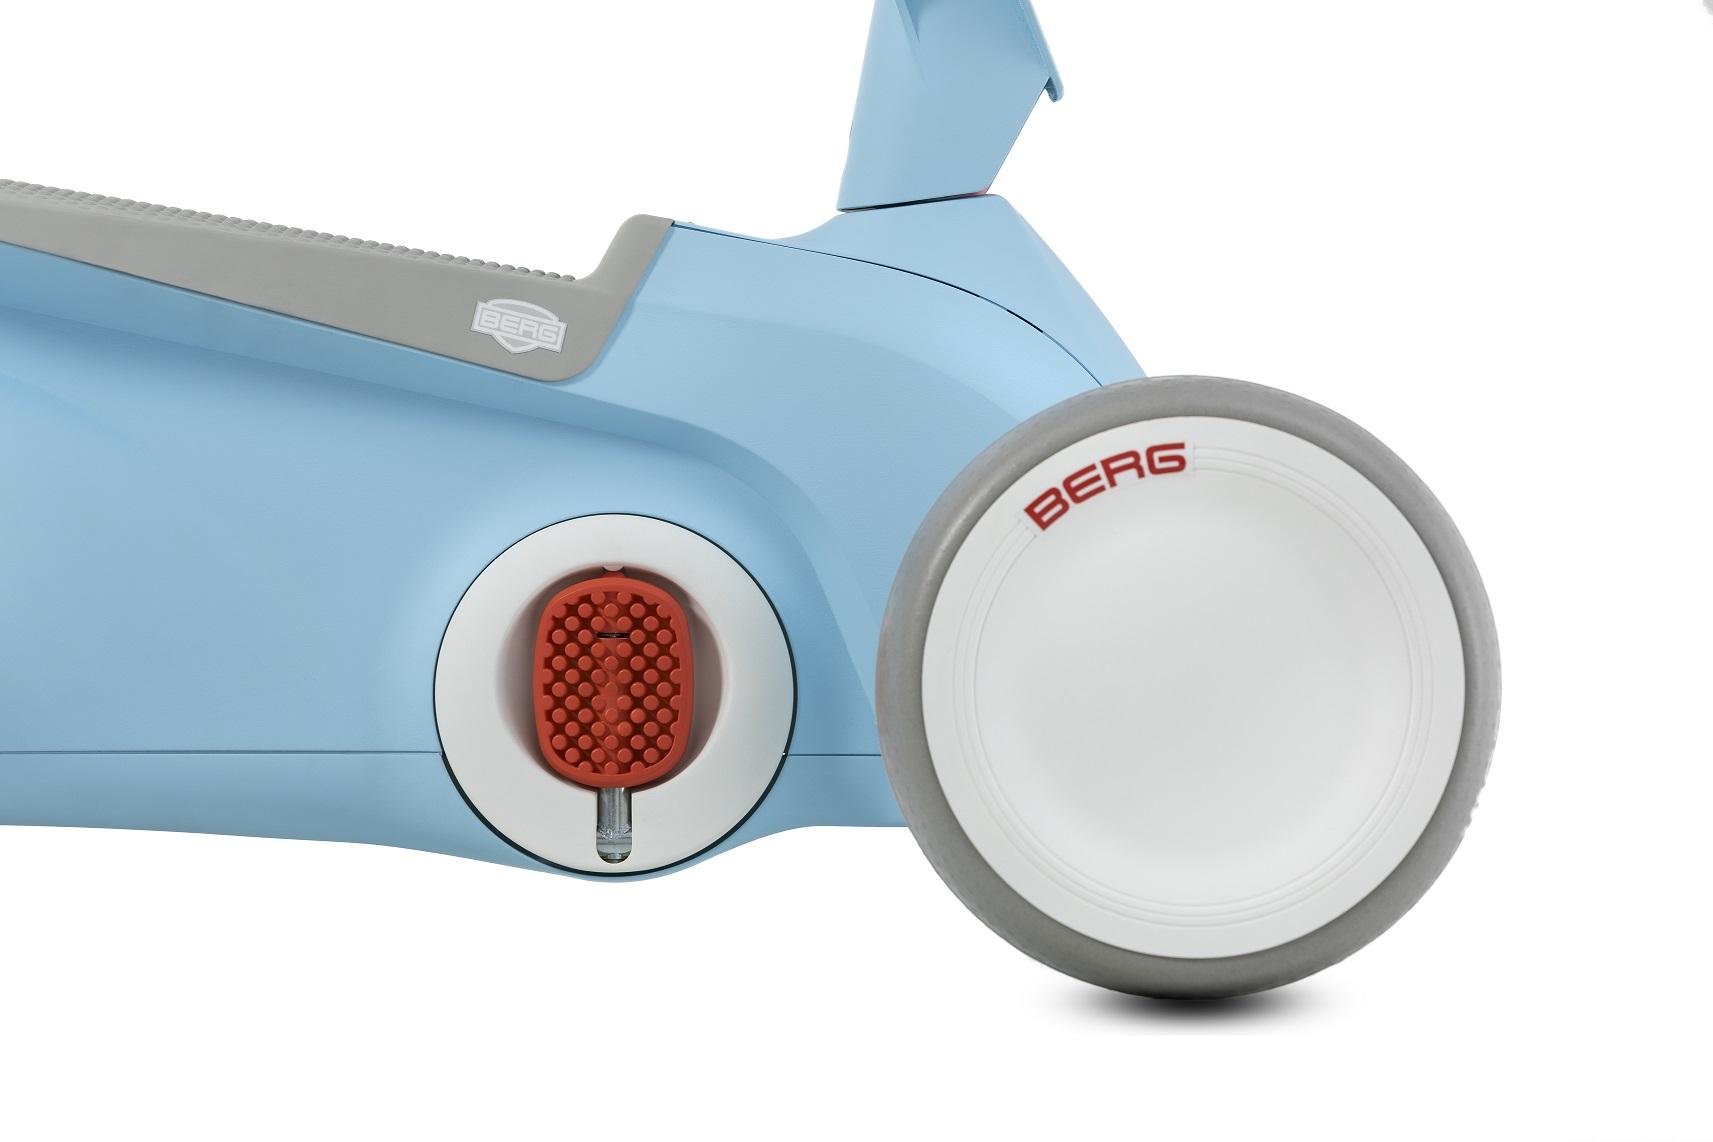 BERG GO2 AZUL - zoom pedales